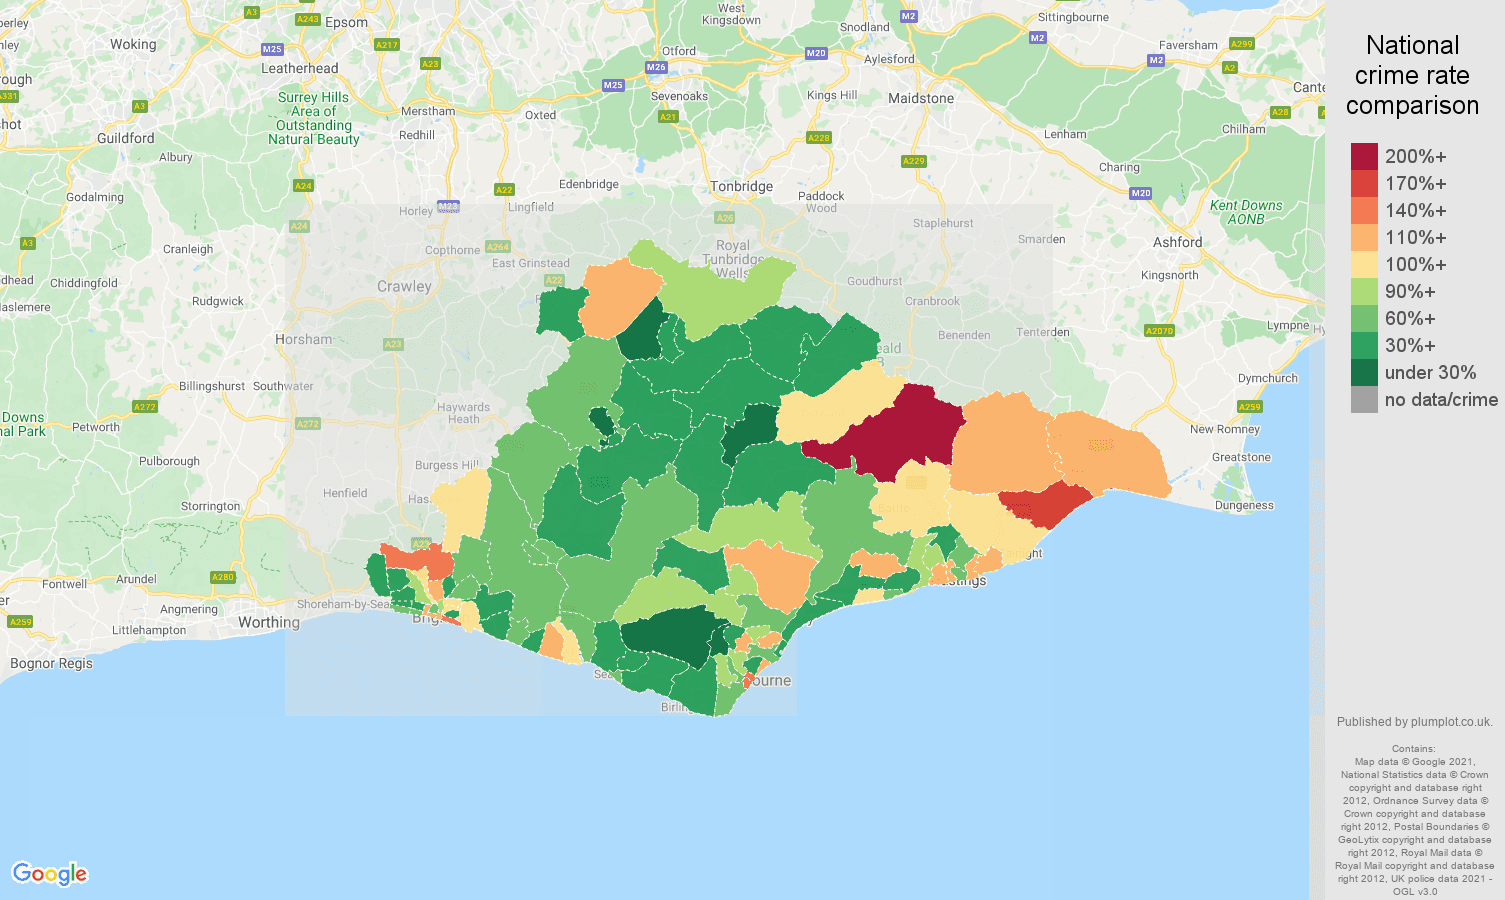 East Sussex burglary crime rate comparison map